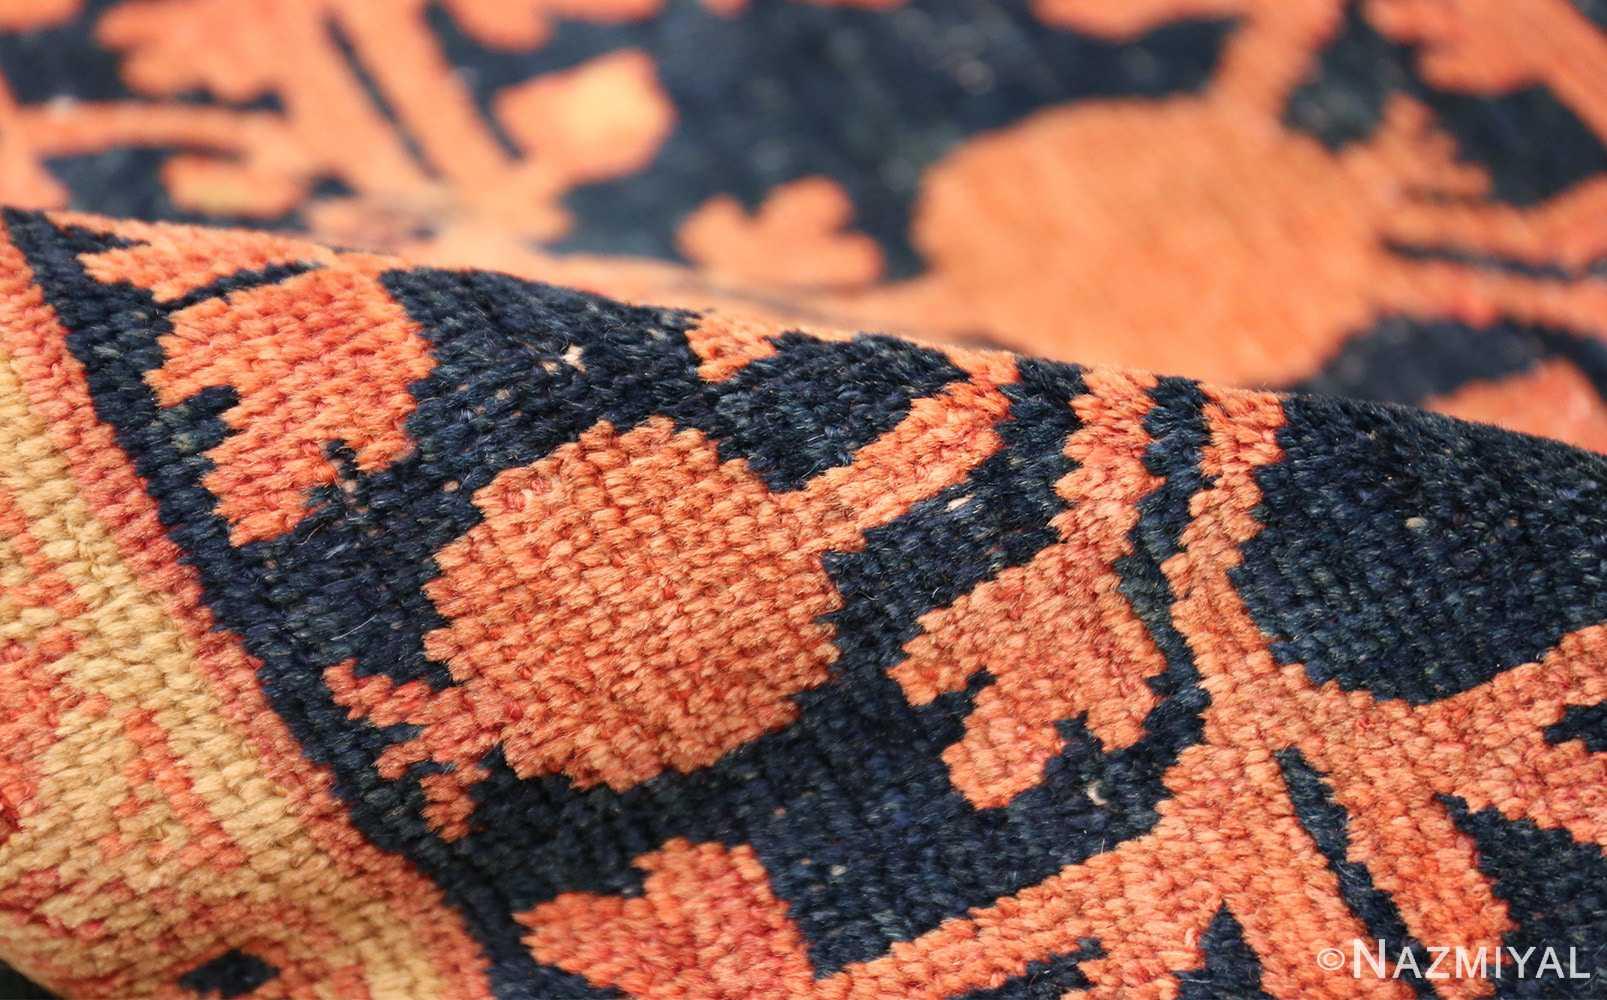 antique navy background pomegranate design khotan rug 49483 pile Nazmiyal